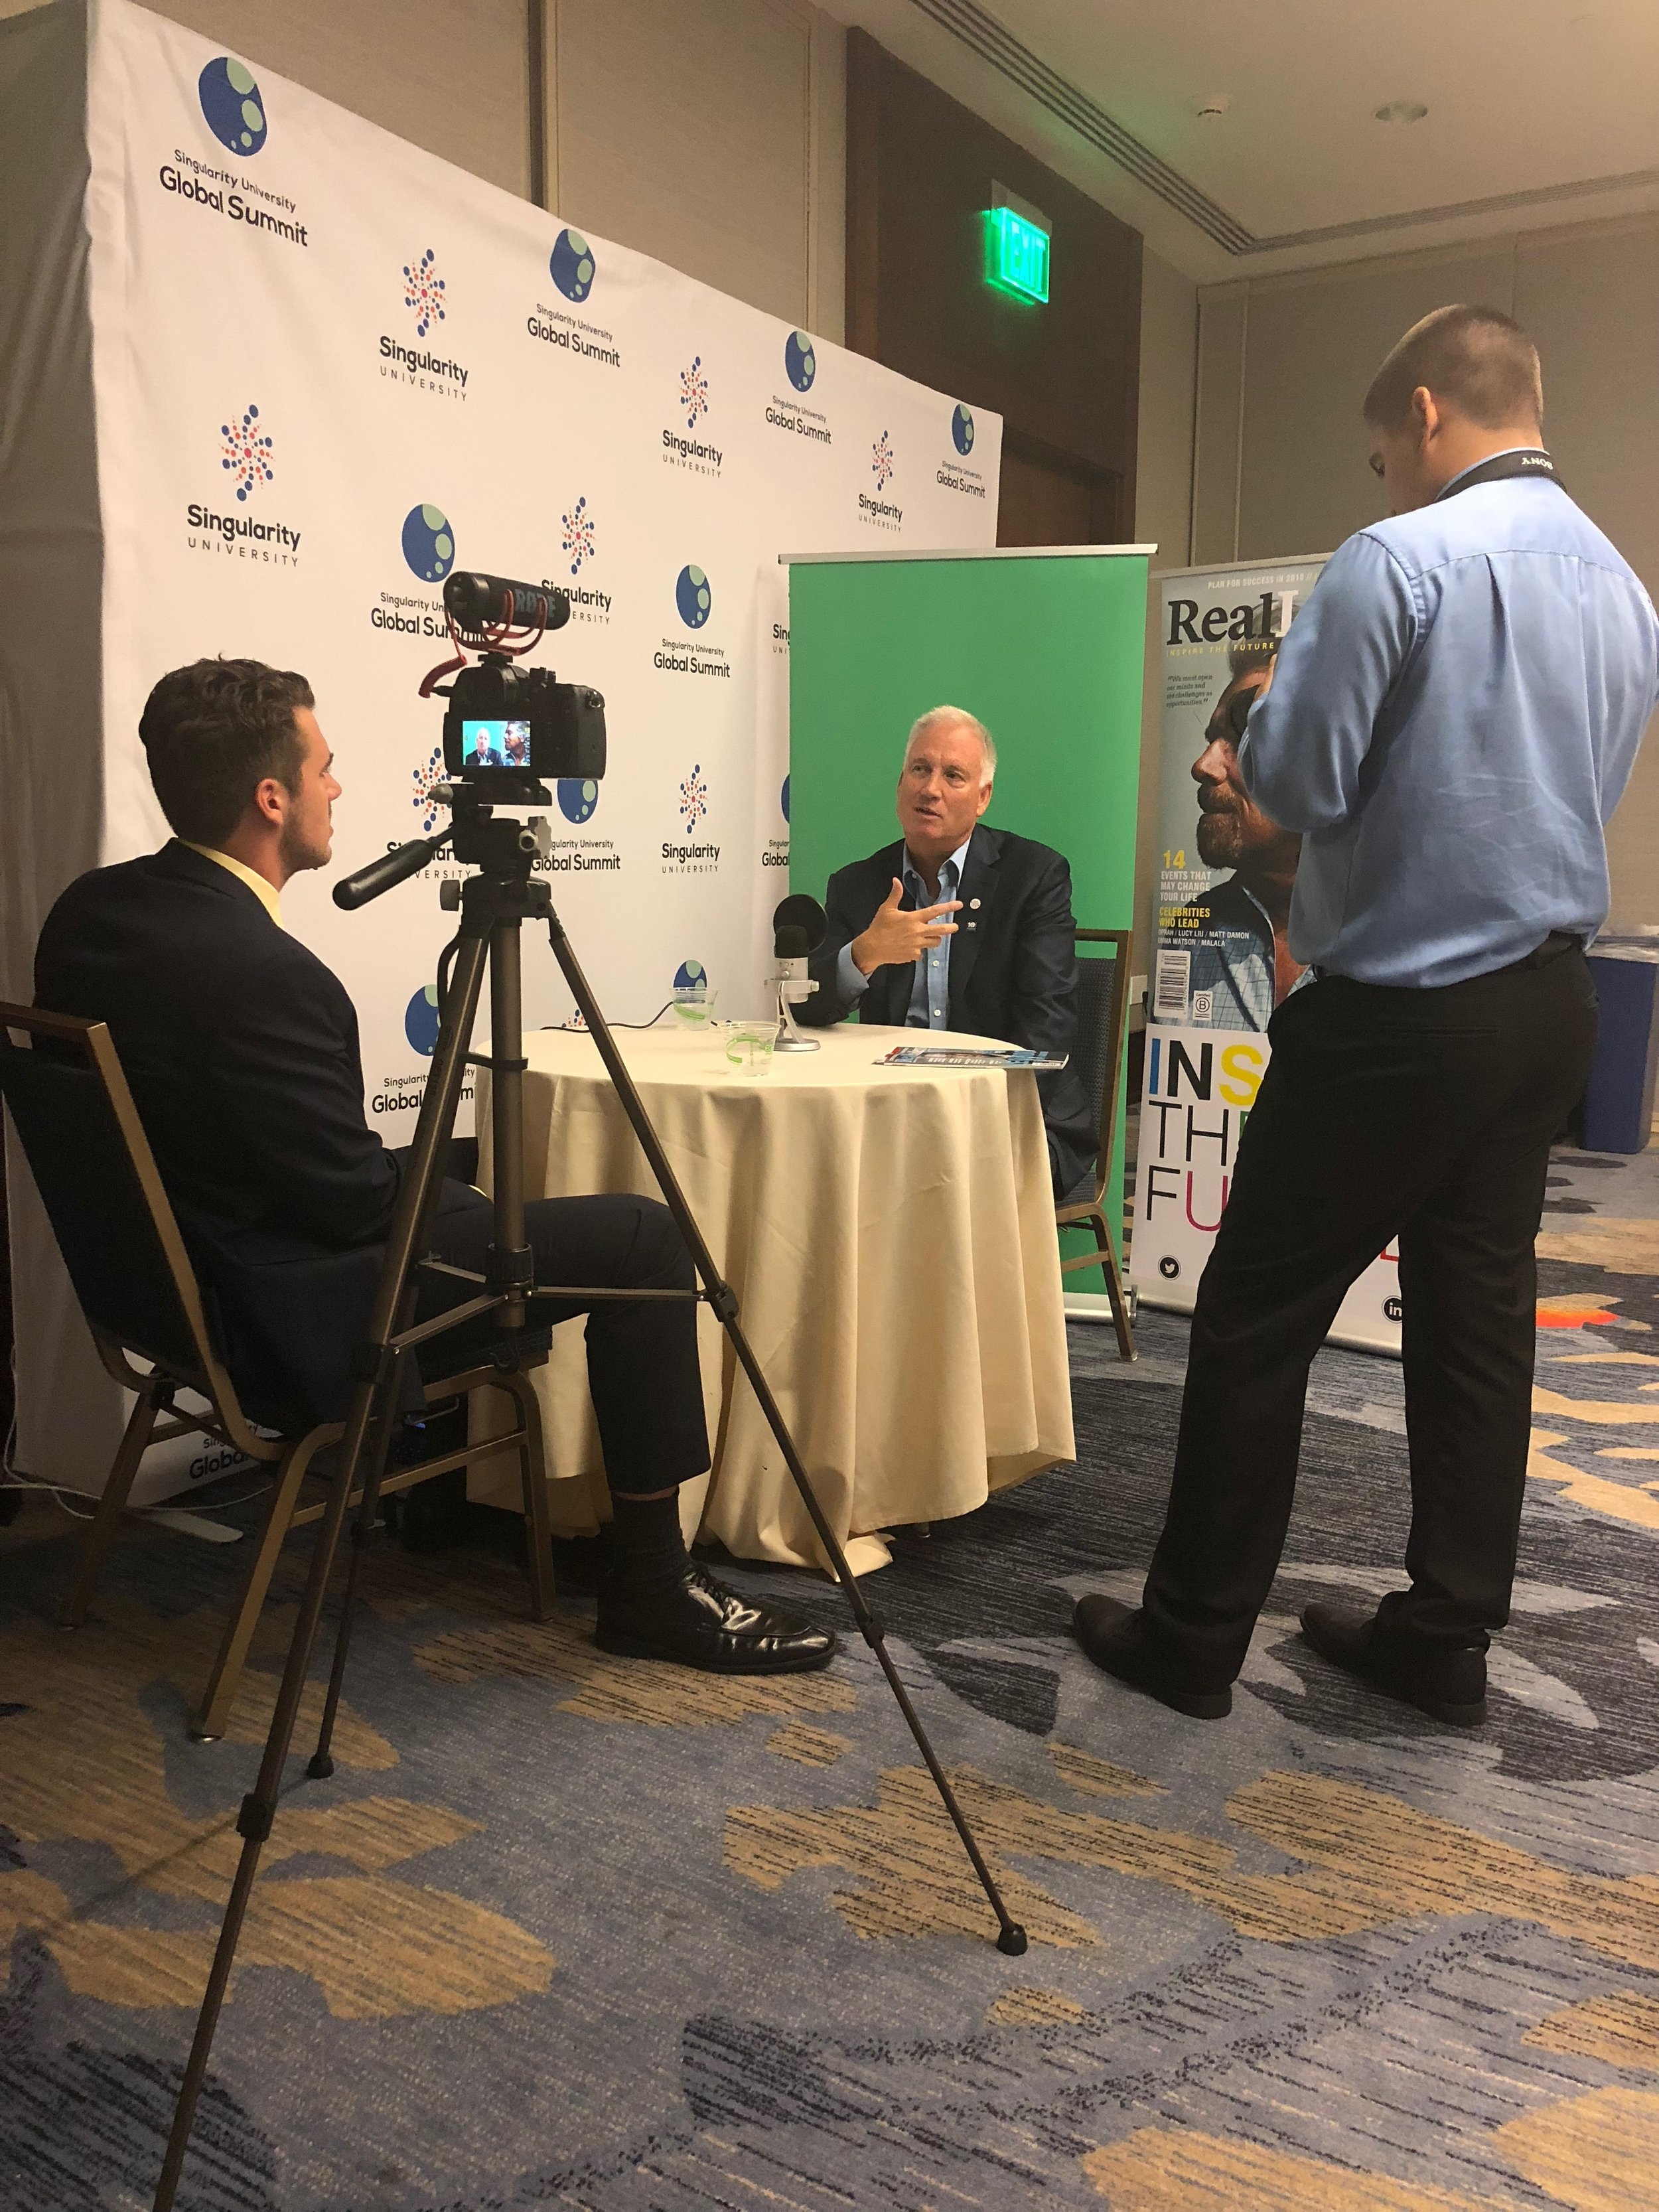 Real Leaders magazine interviewing Erik Anderson, chairman of Singularity University.